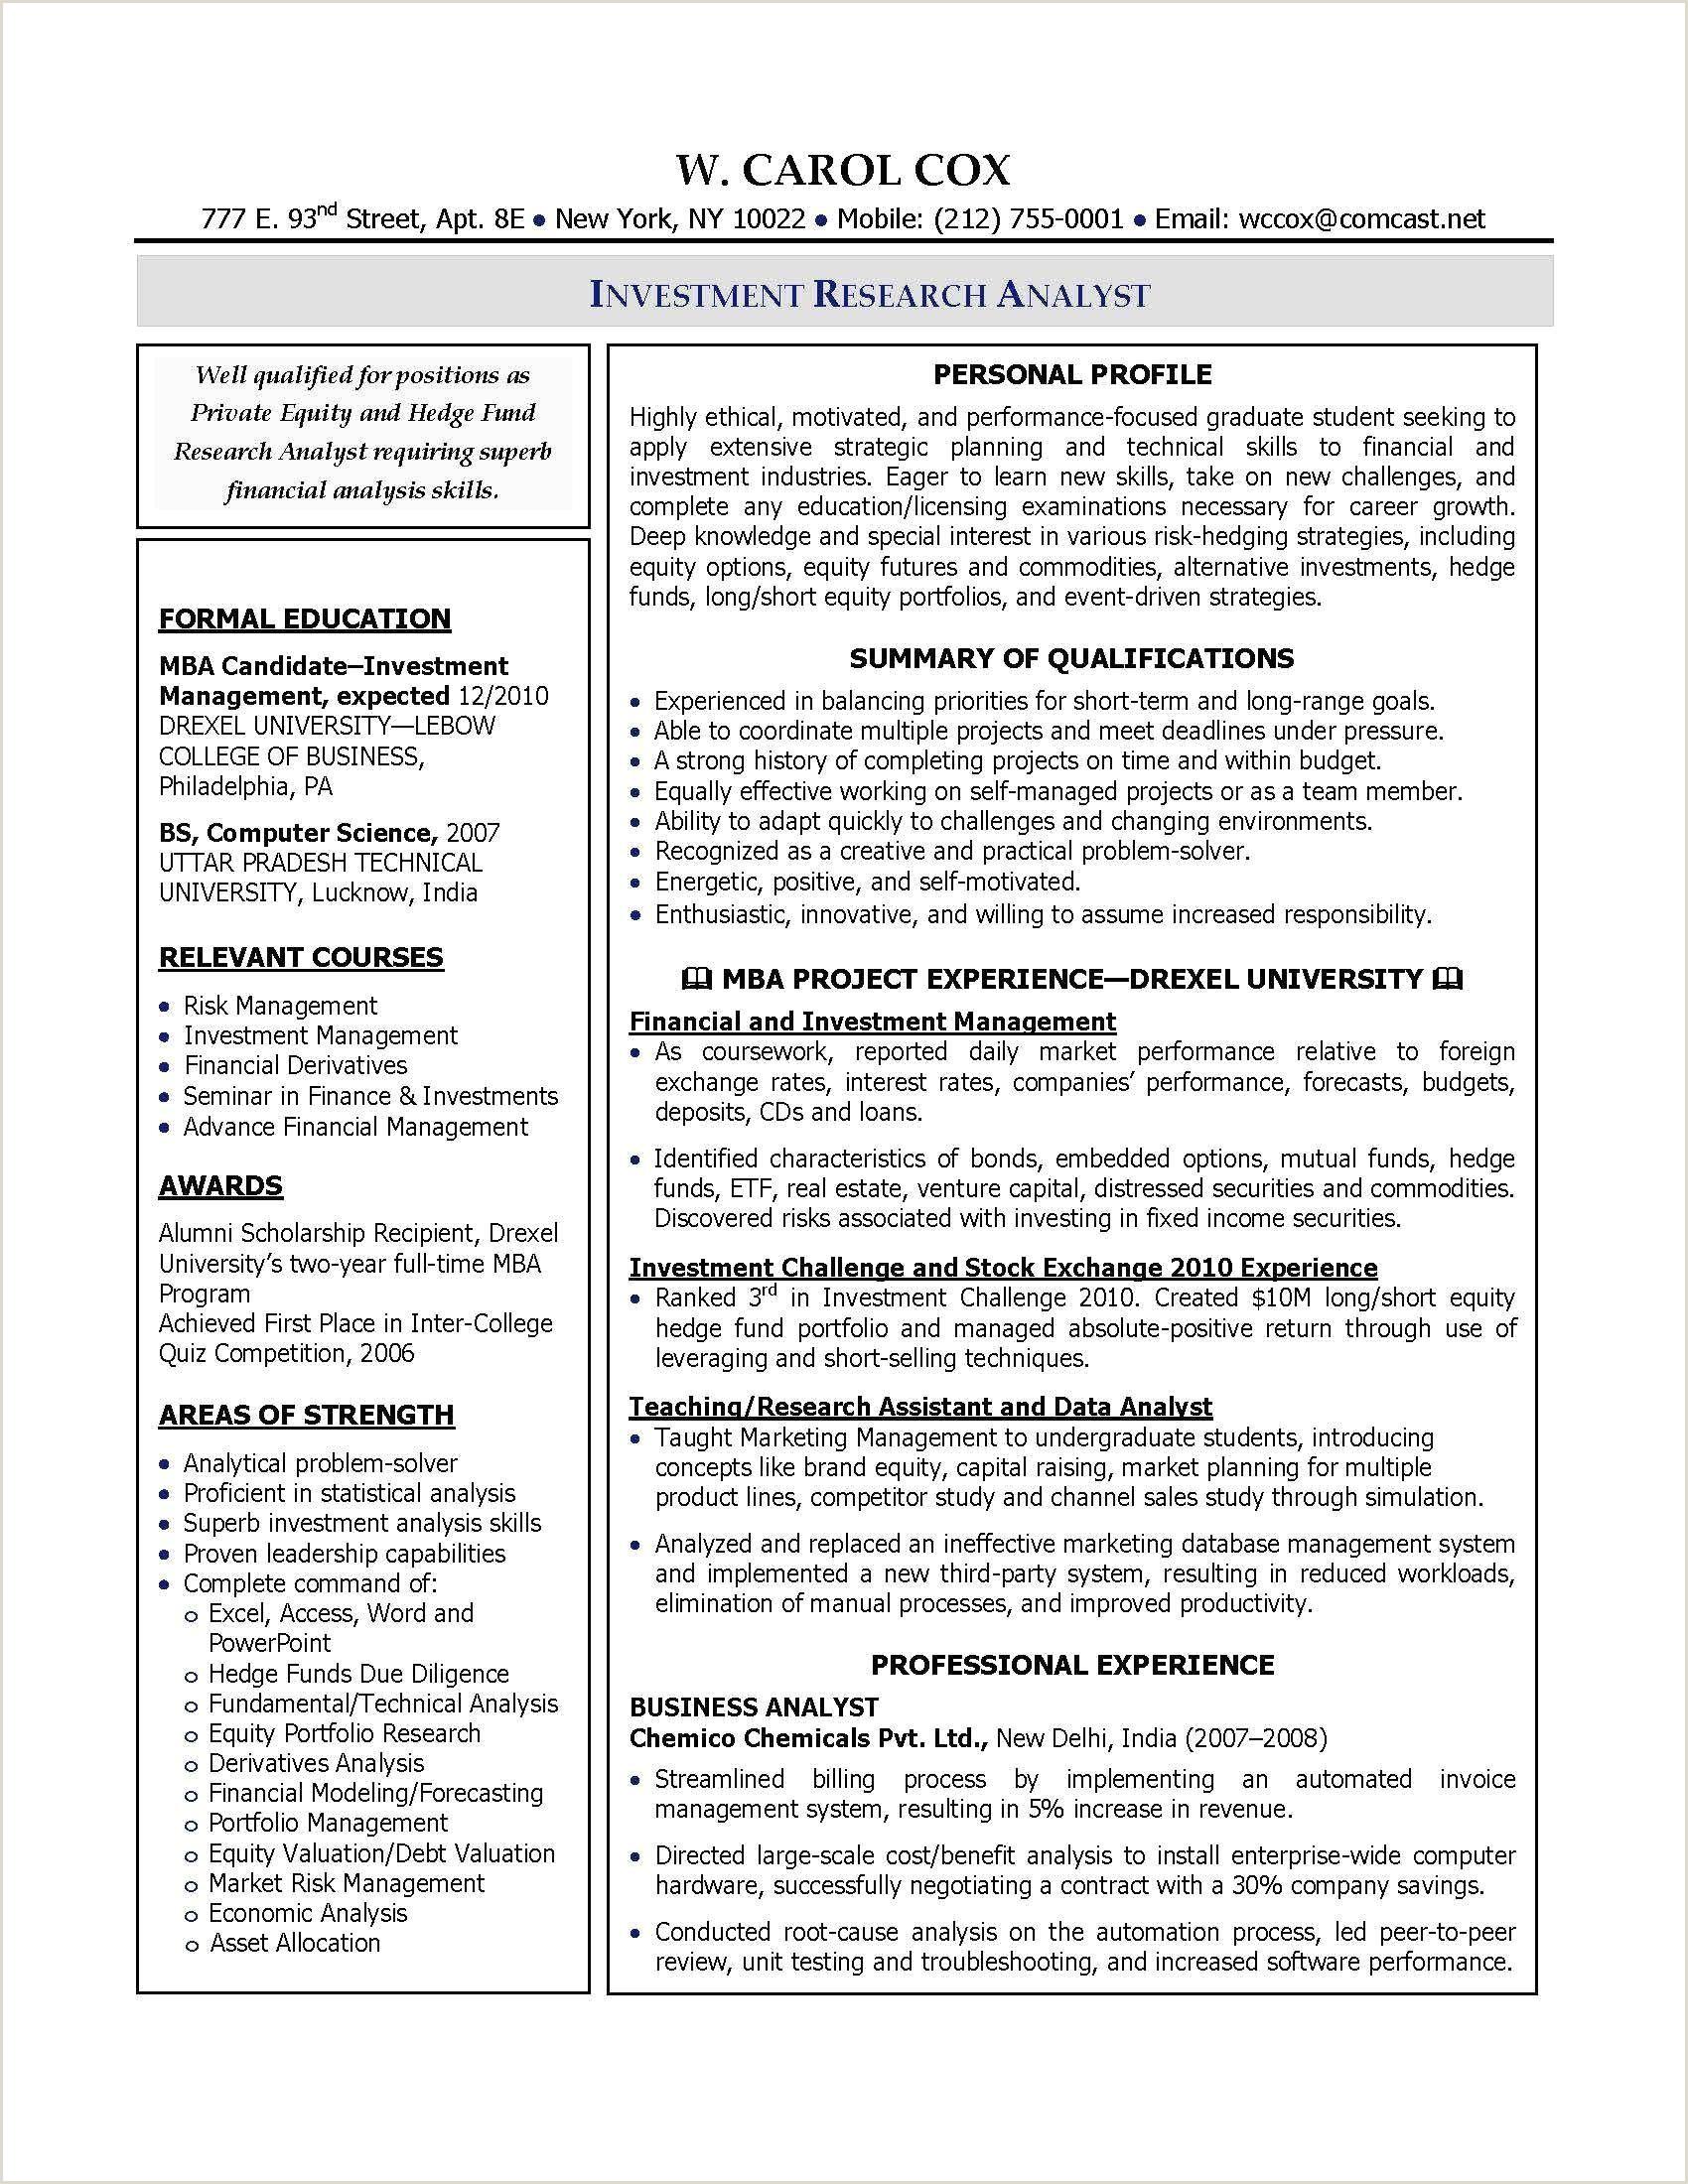 14 Career Cruising Resume Template Samples Printable